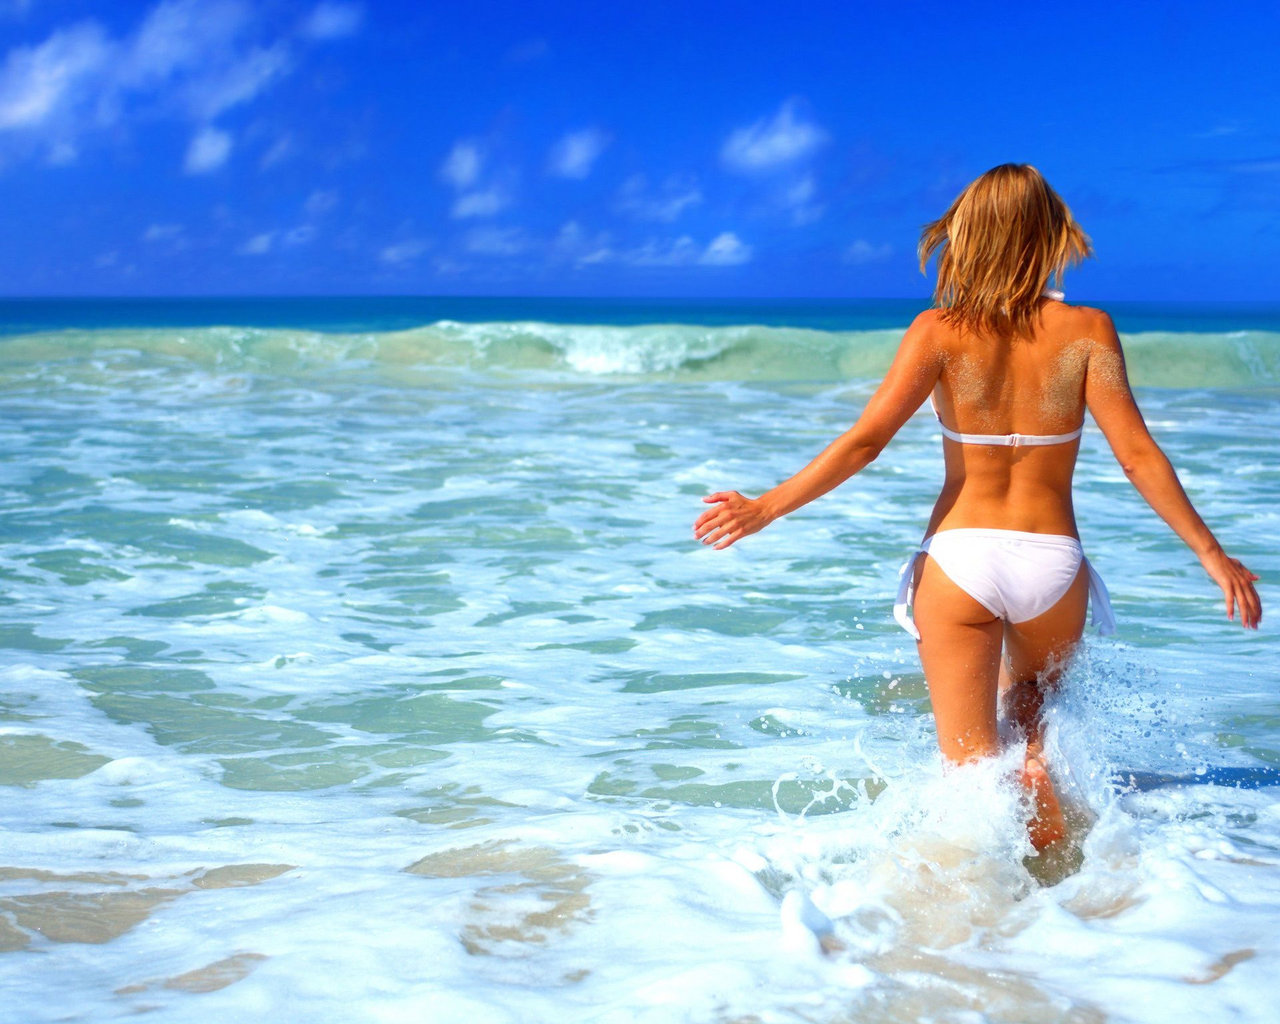 krasivie-devushki-v-bikini-kachestvennie-fotooboi-foto-golih-na-ribalke